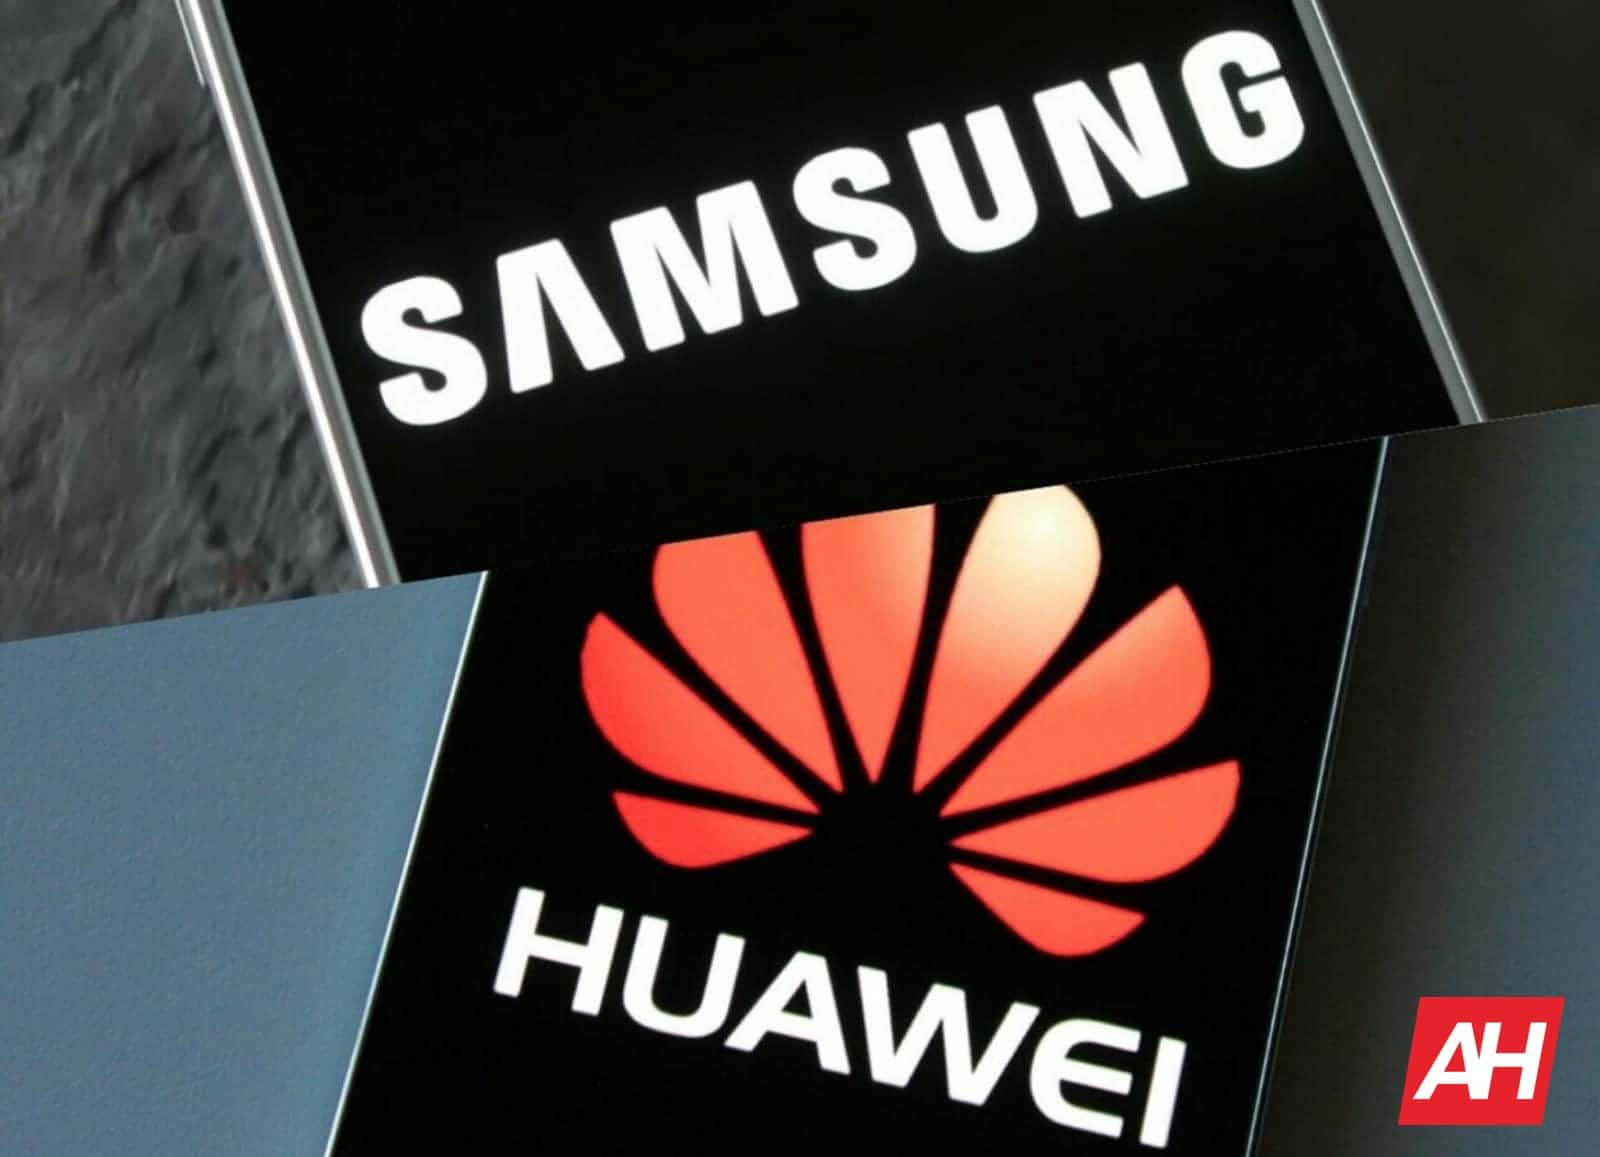 Samsung and Huawei logo AH 2019